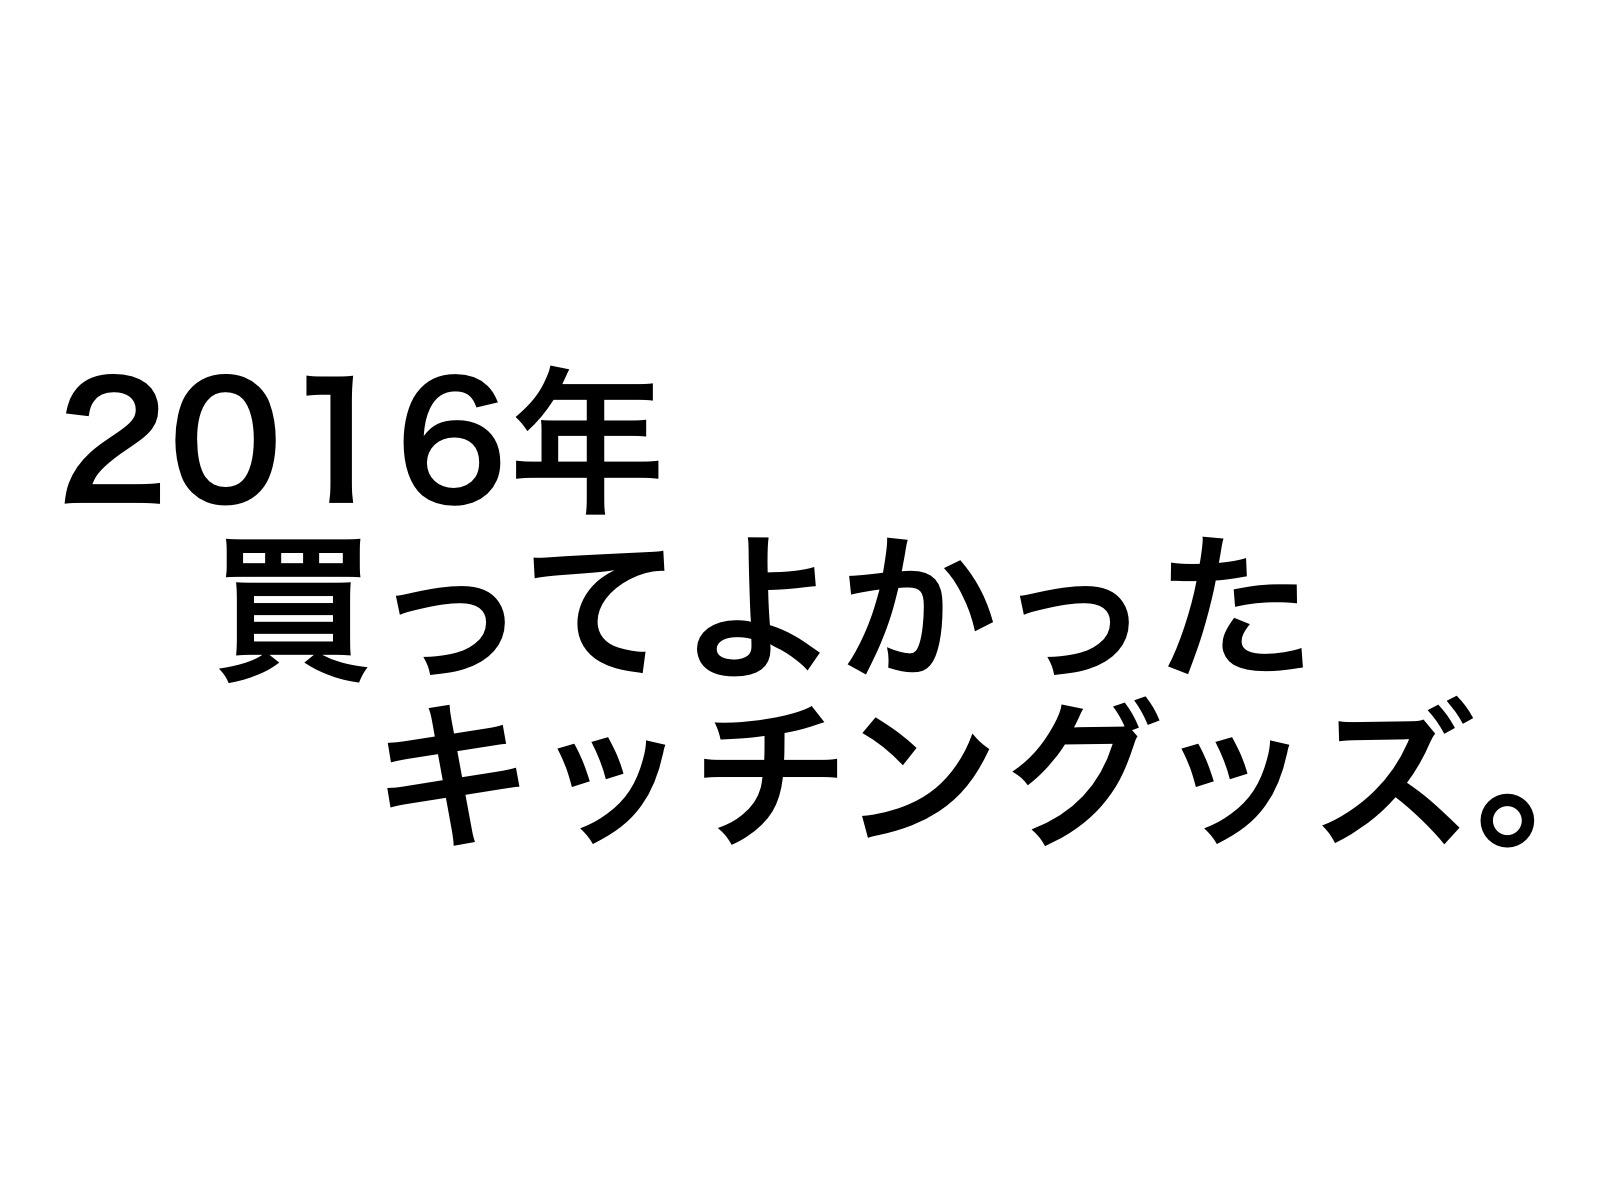 2016 12 31 13 07 41